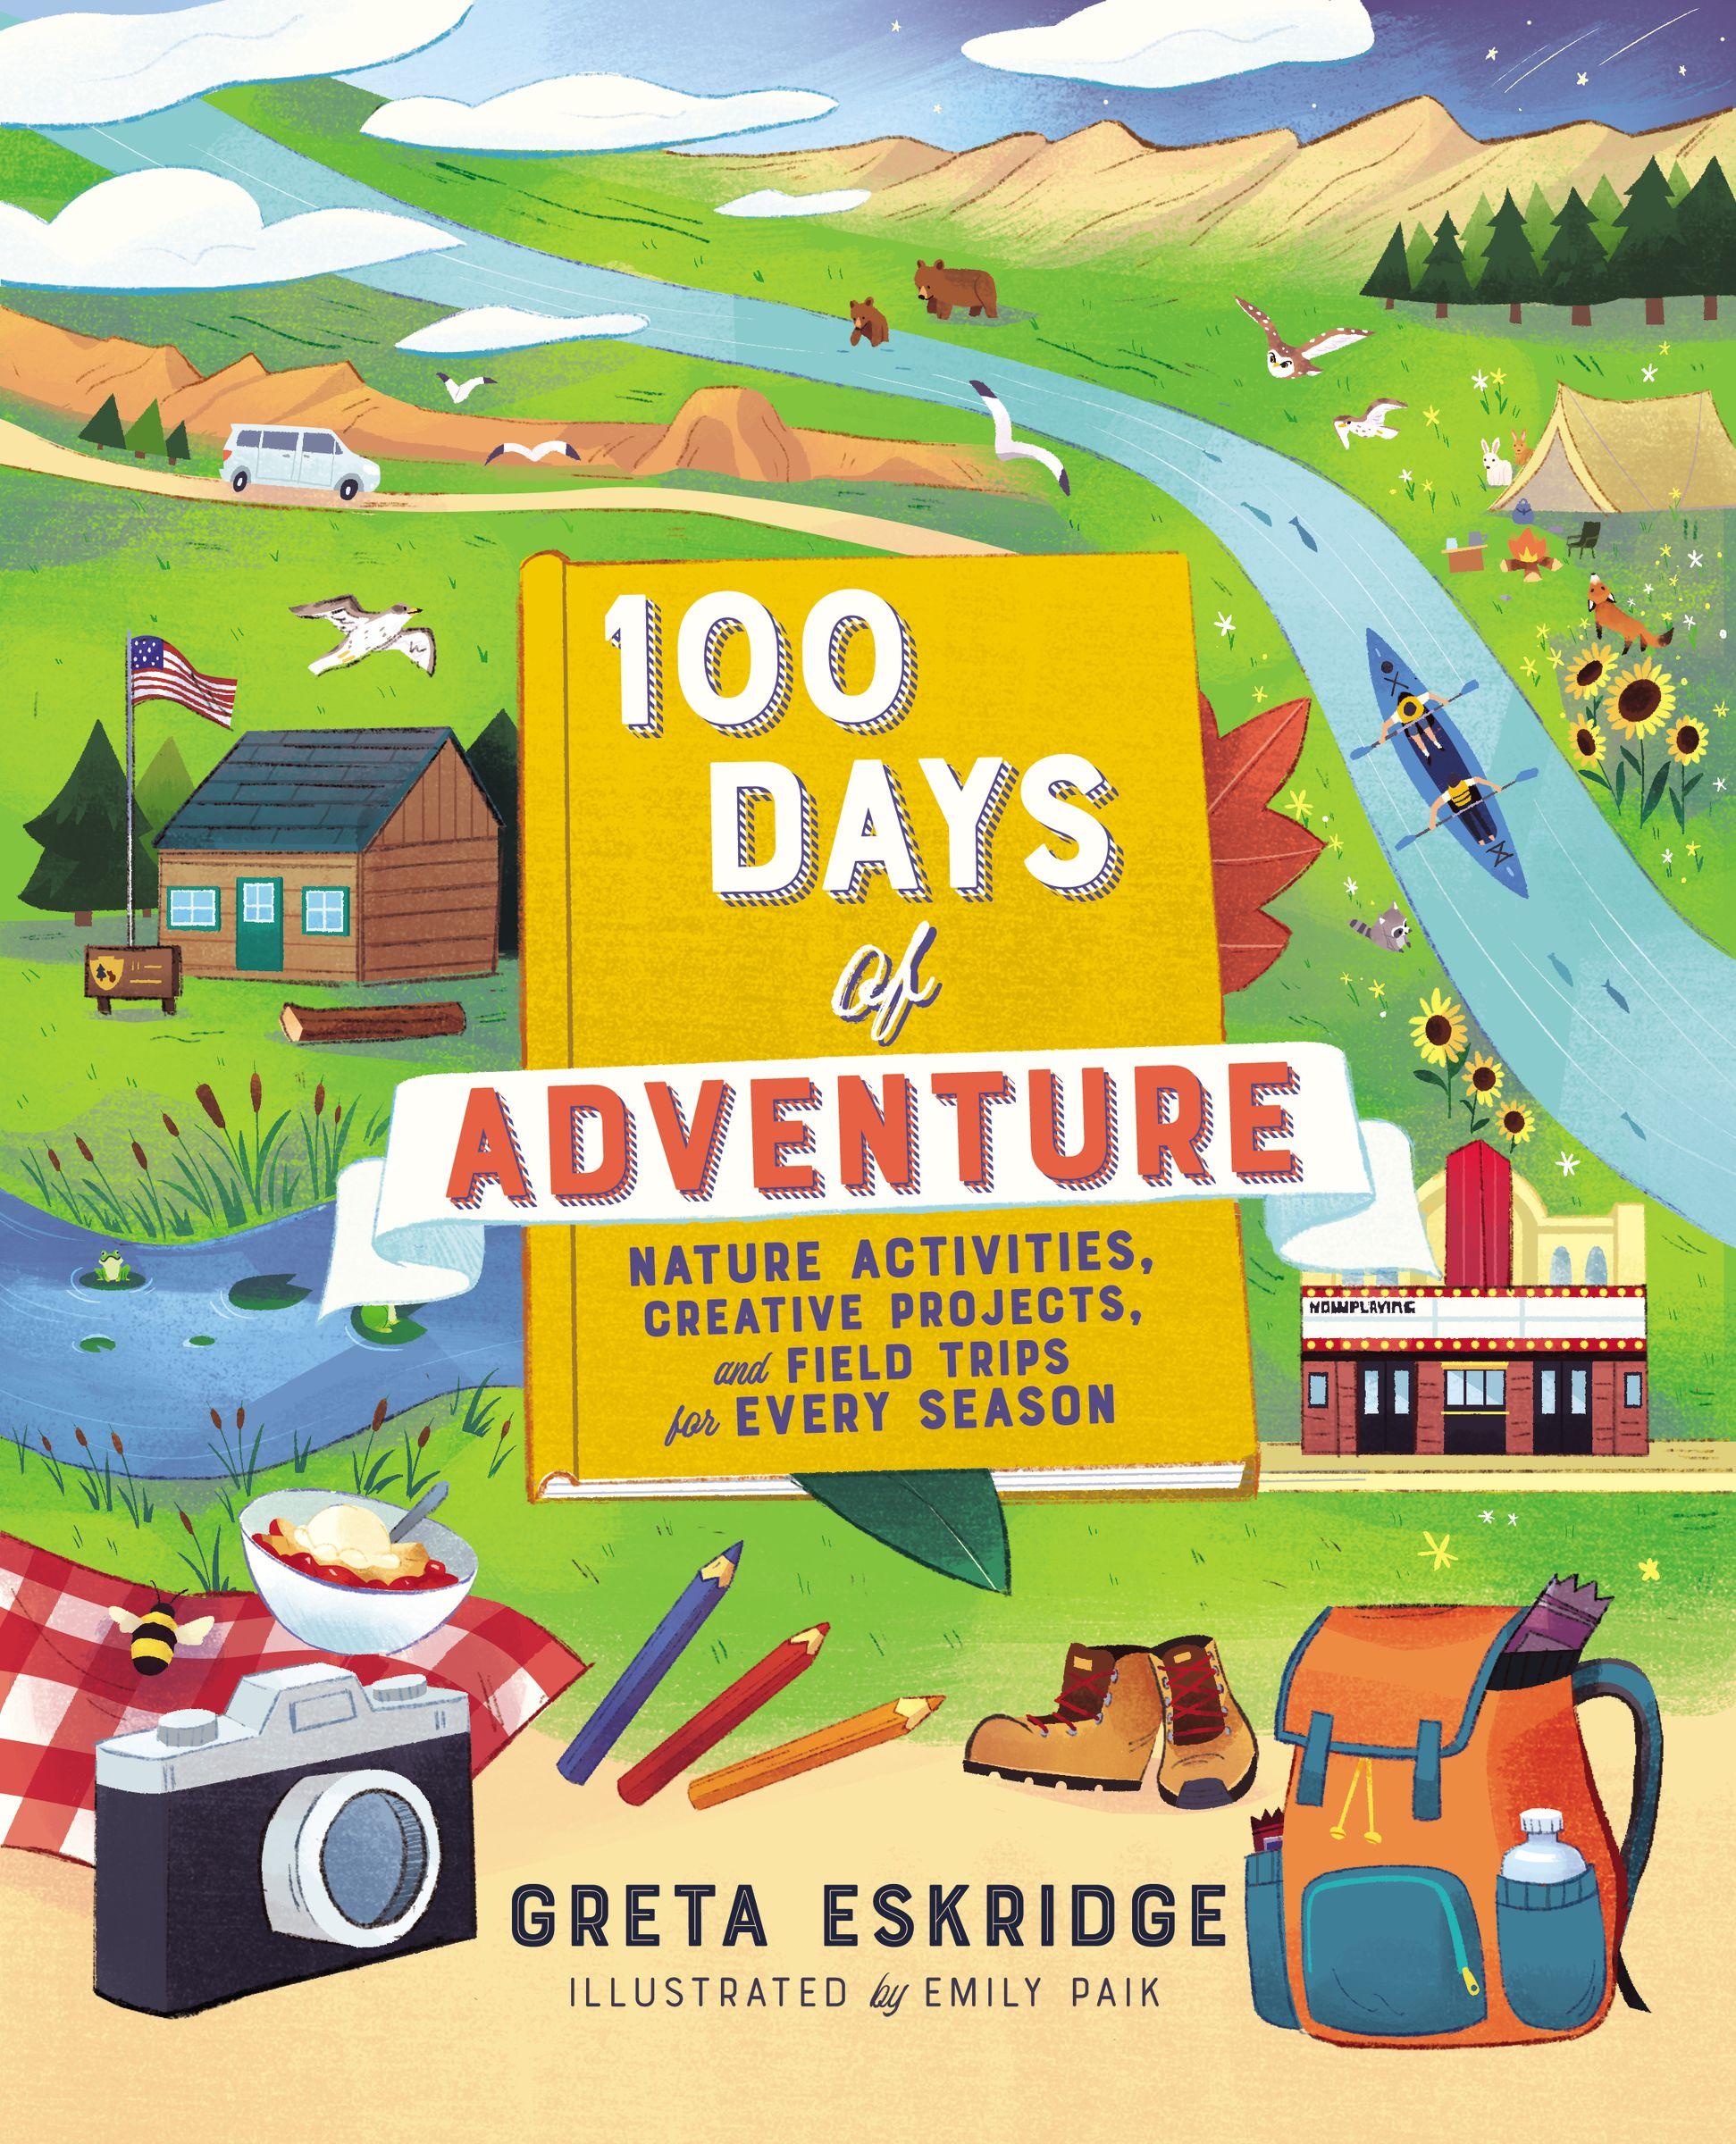 100 Days of Adventure